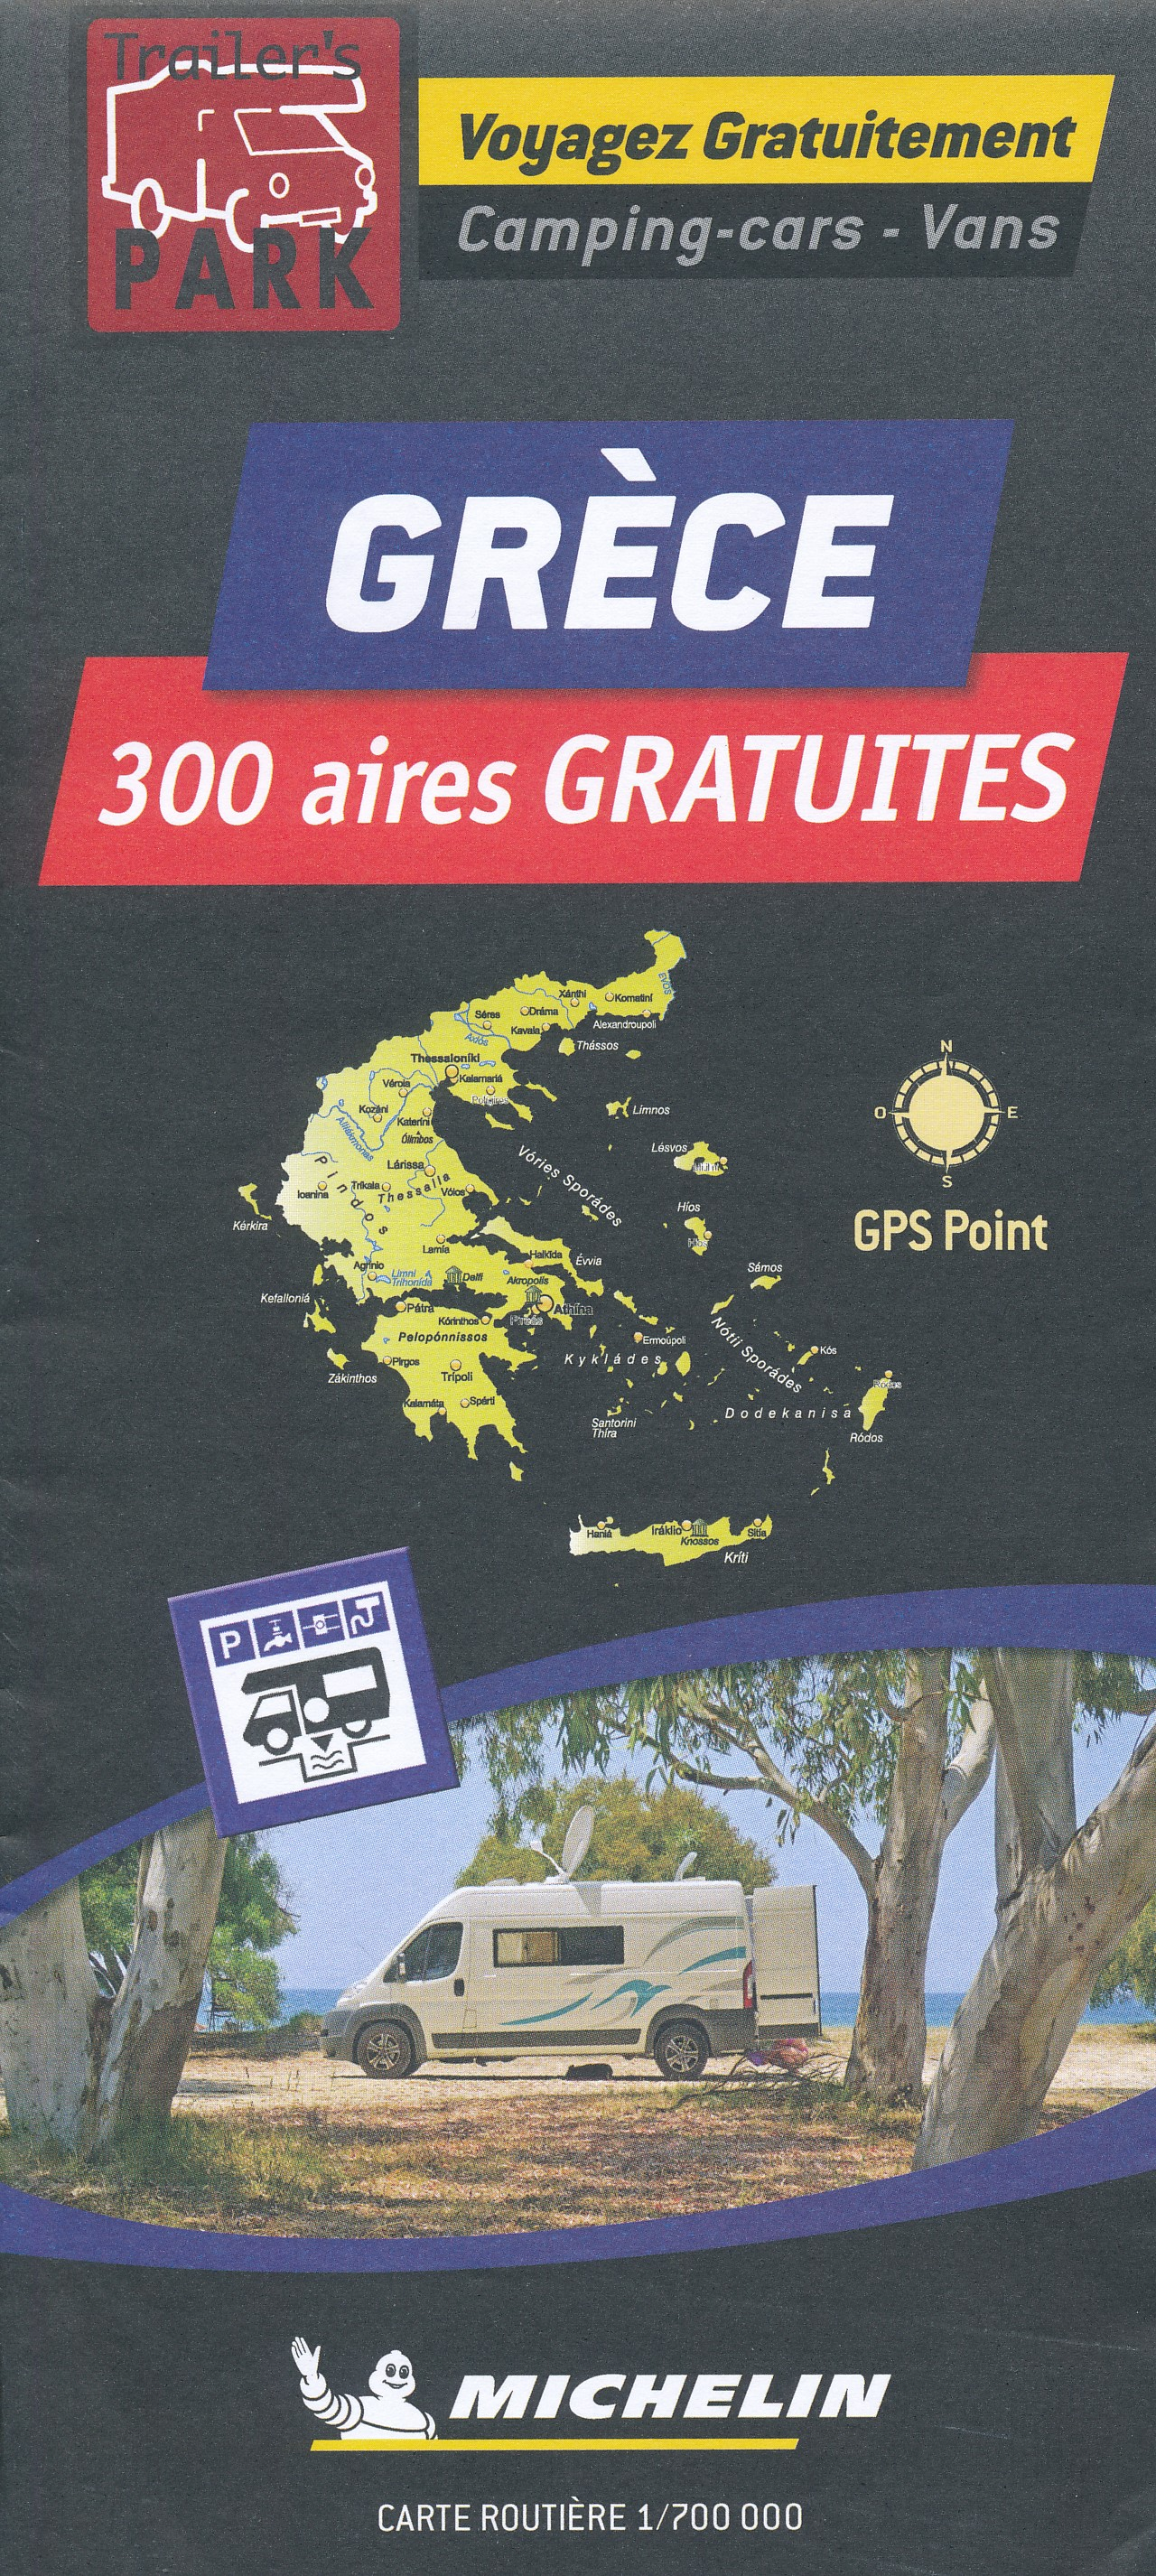 Camperkaart - Wegenkaart - landkaart Griekenland | Michelin